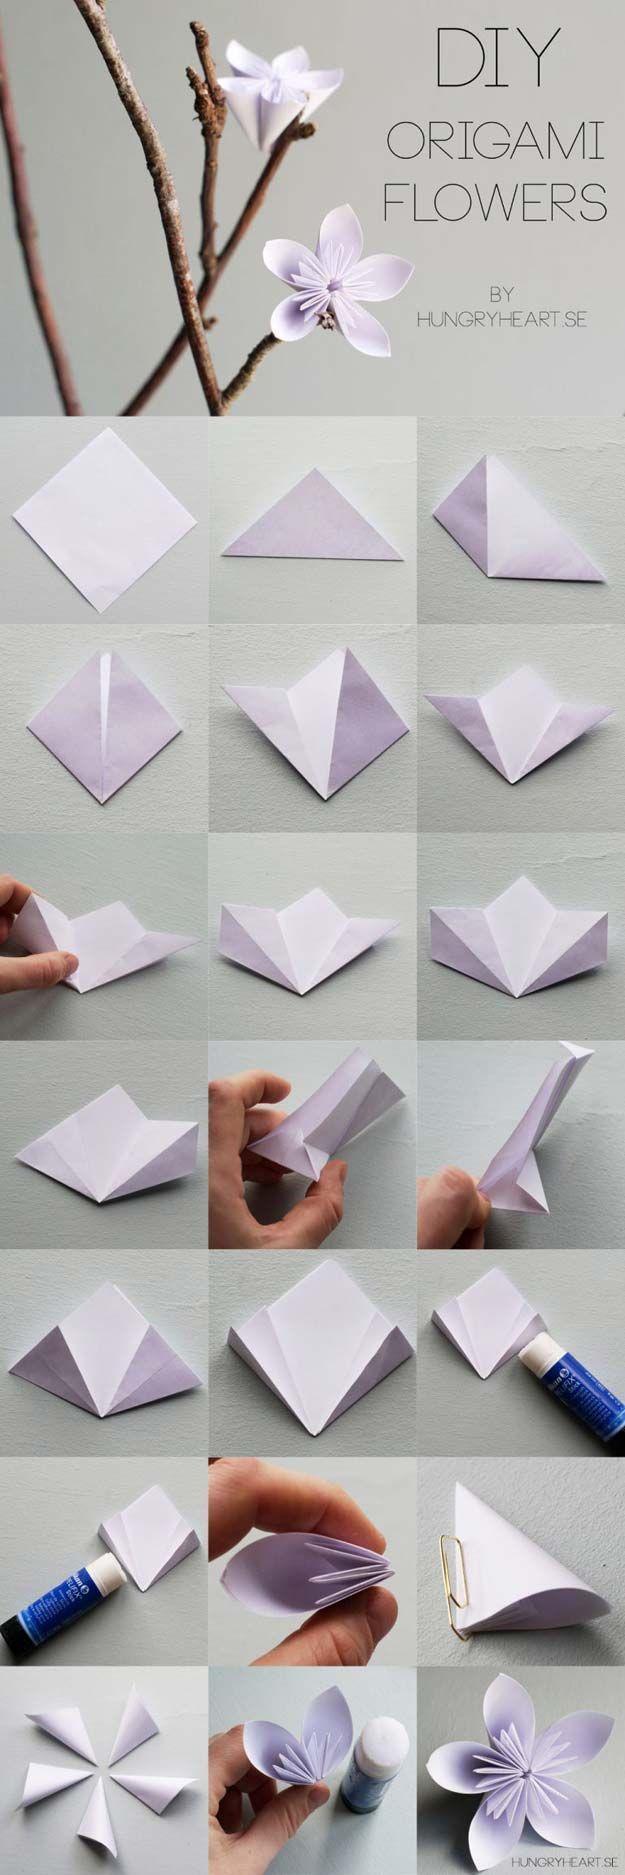 Best Origami Tutorials – Flower Origami – Easy DIY…